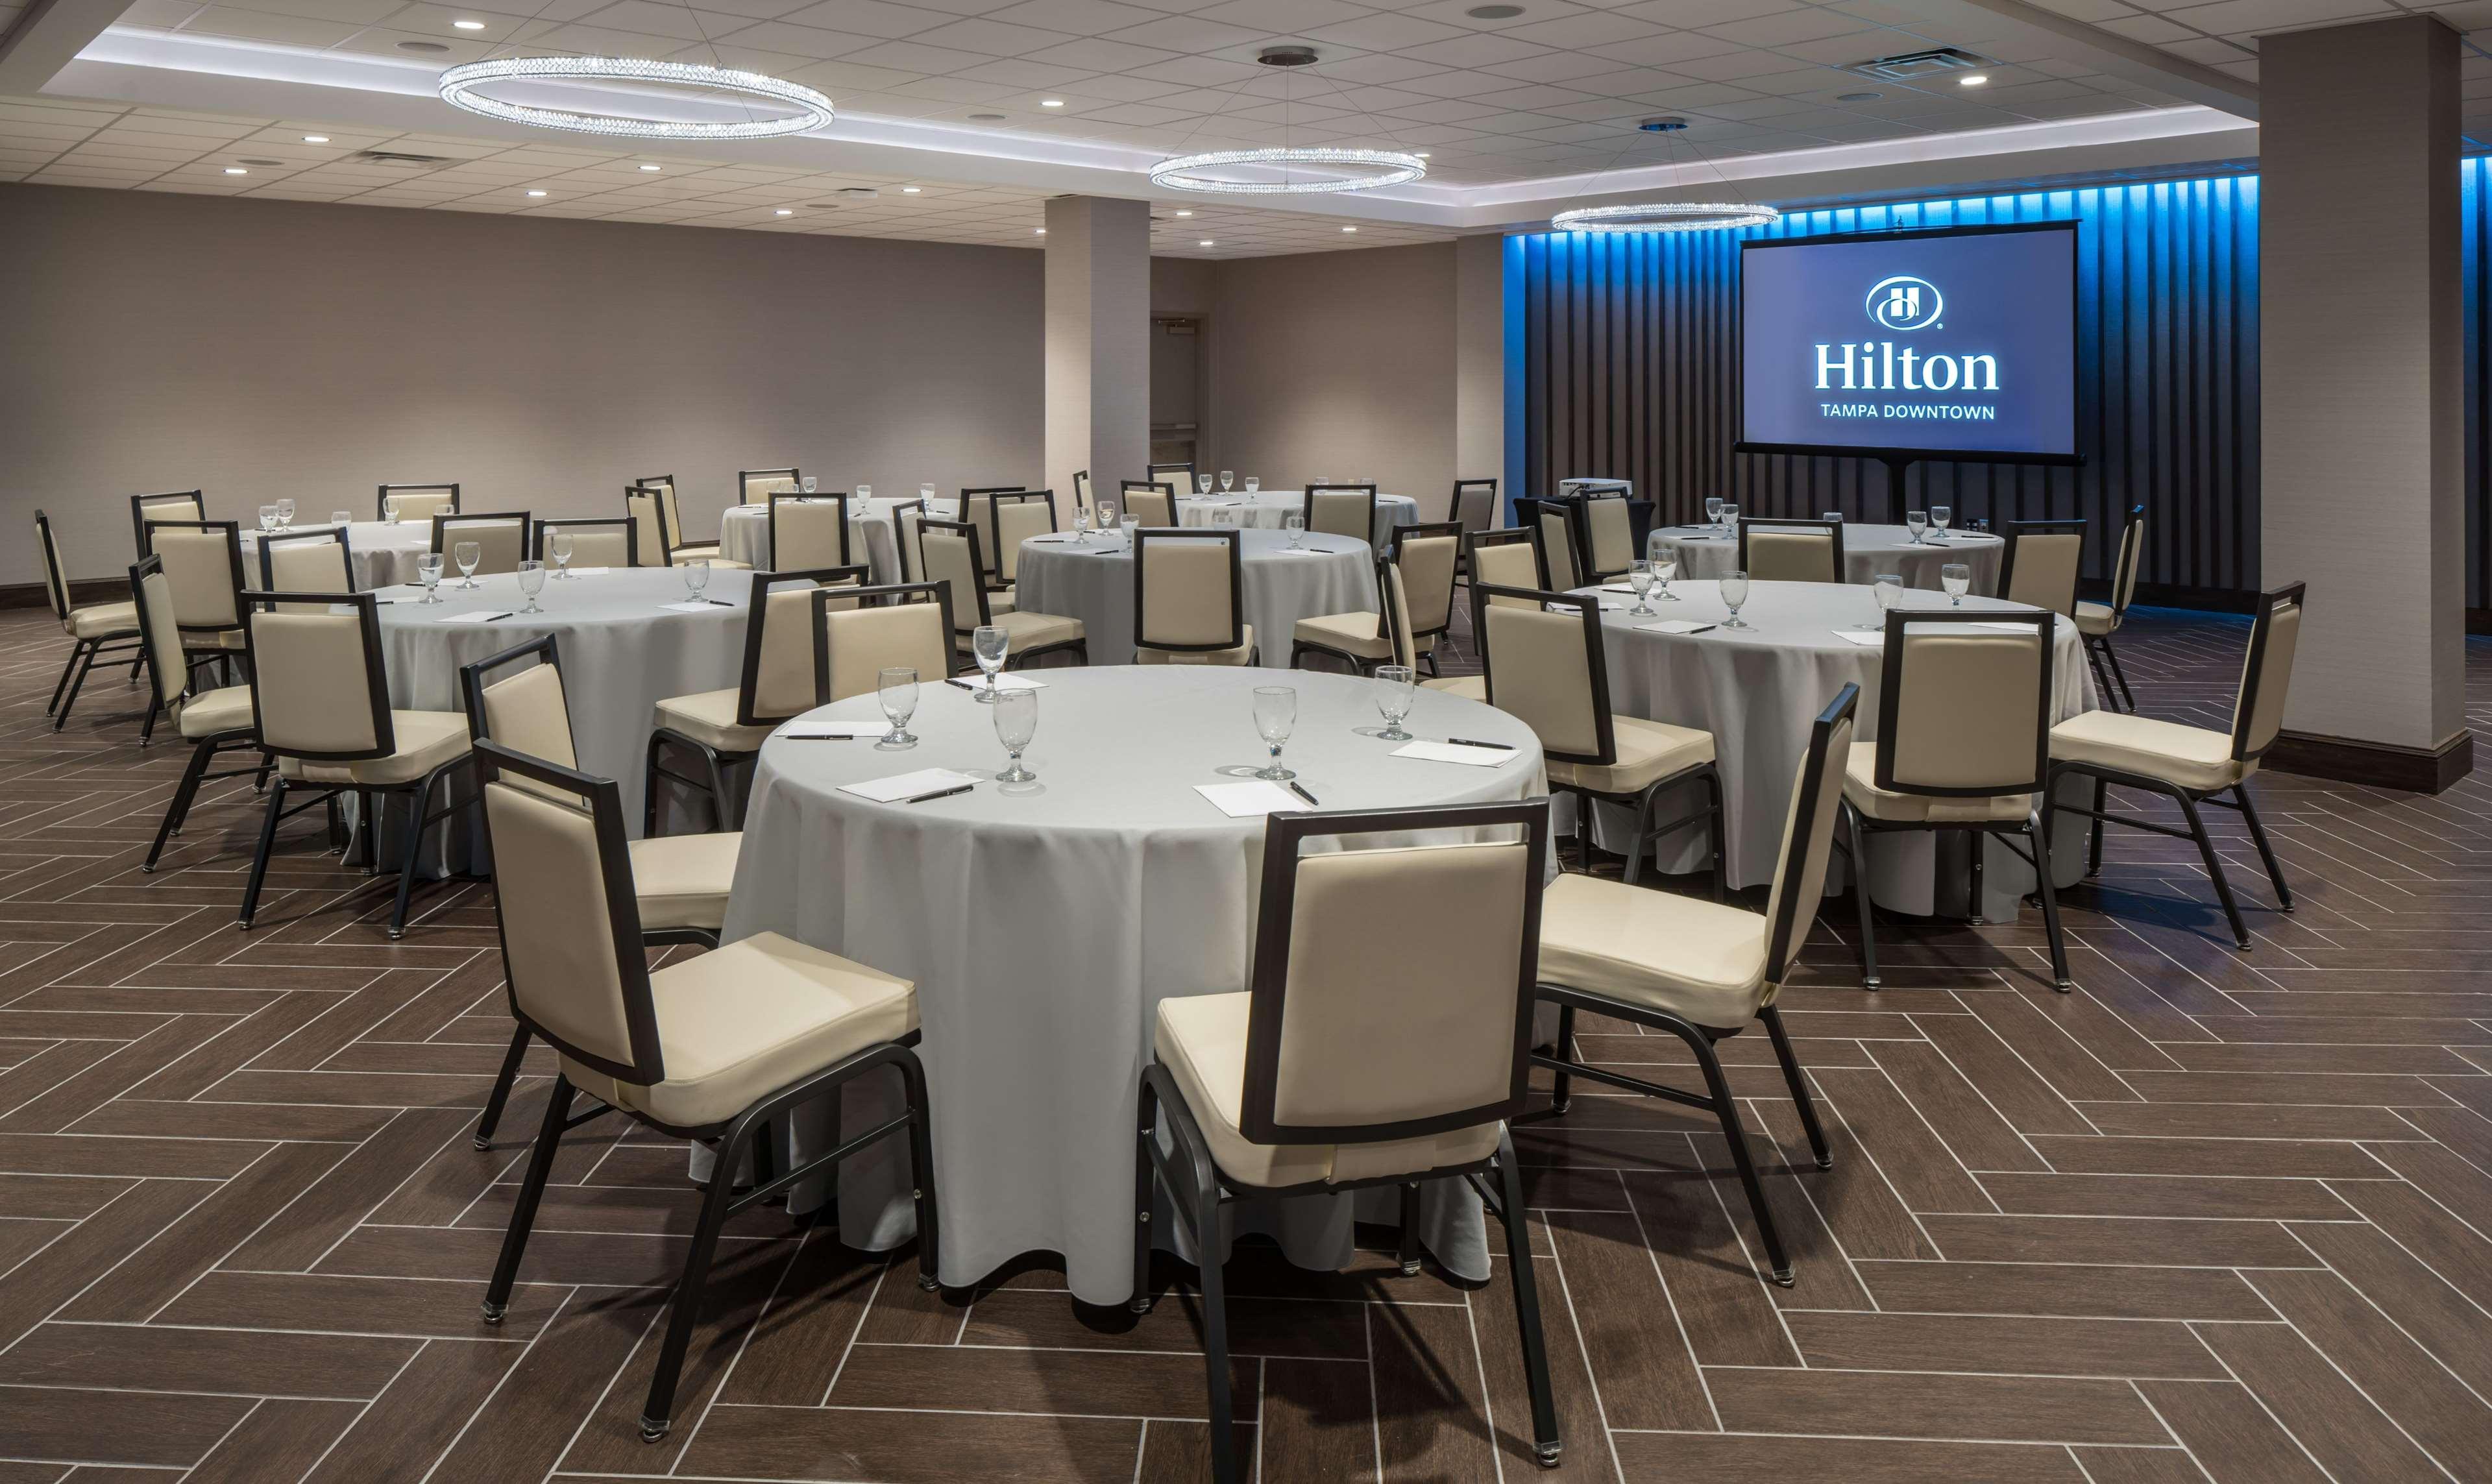 Hilton Tampa Downtown image 32